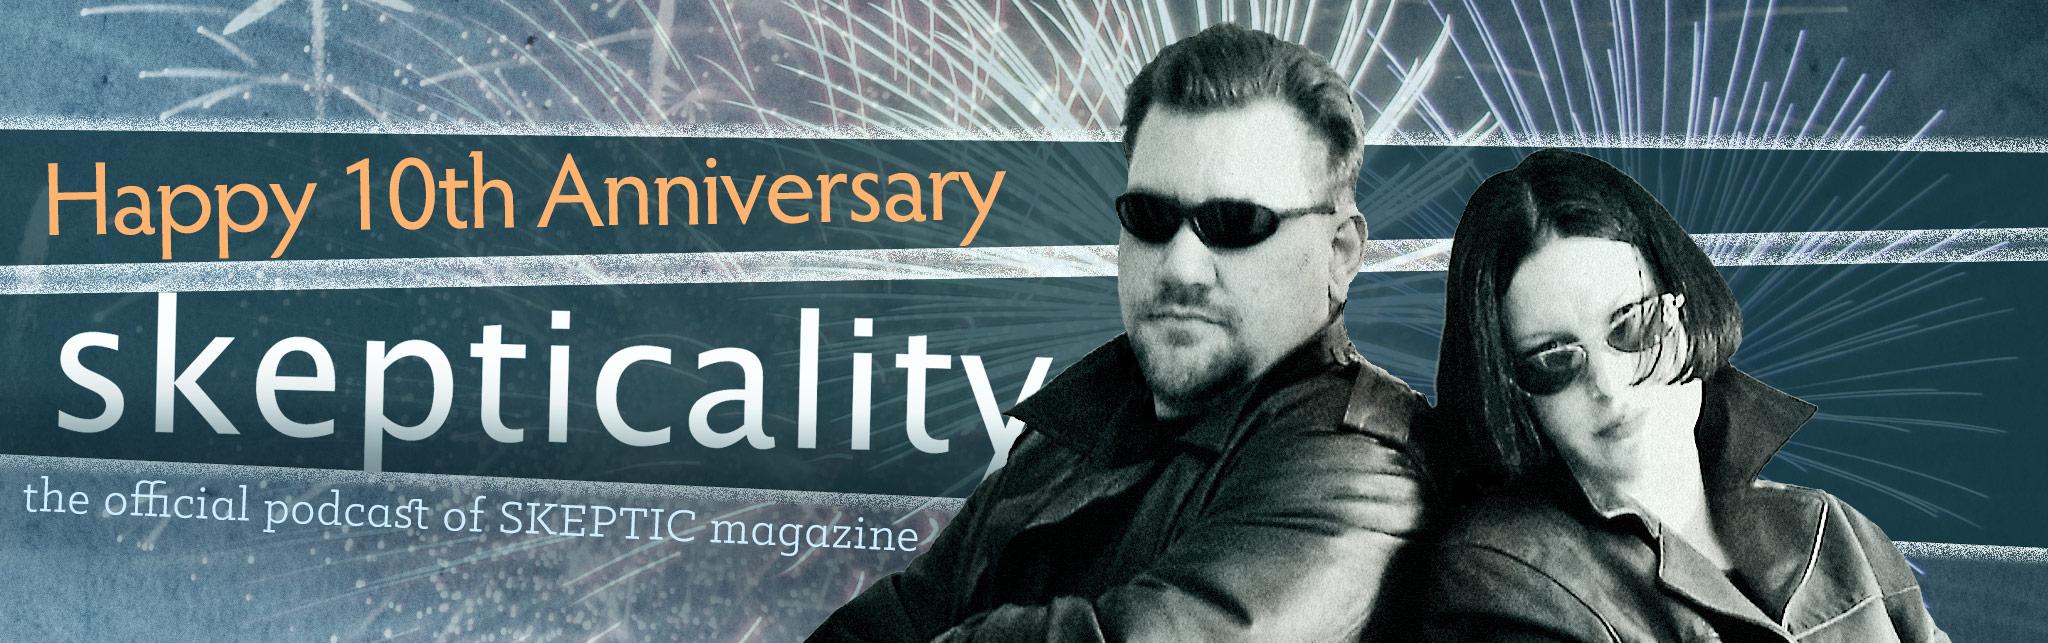 Skepticality logo (Happy 10th Anniversary!)